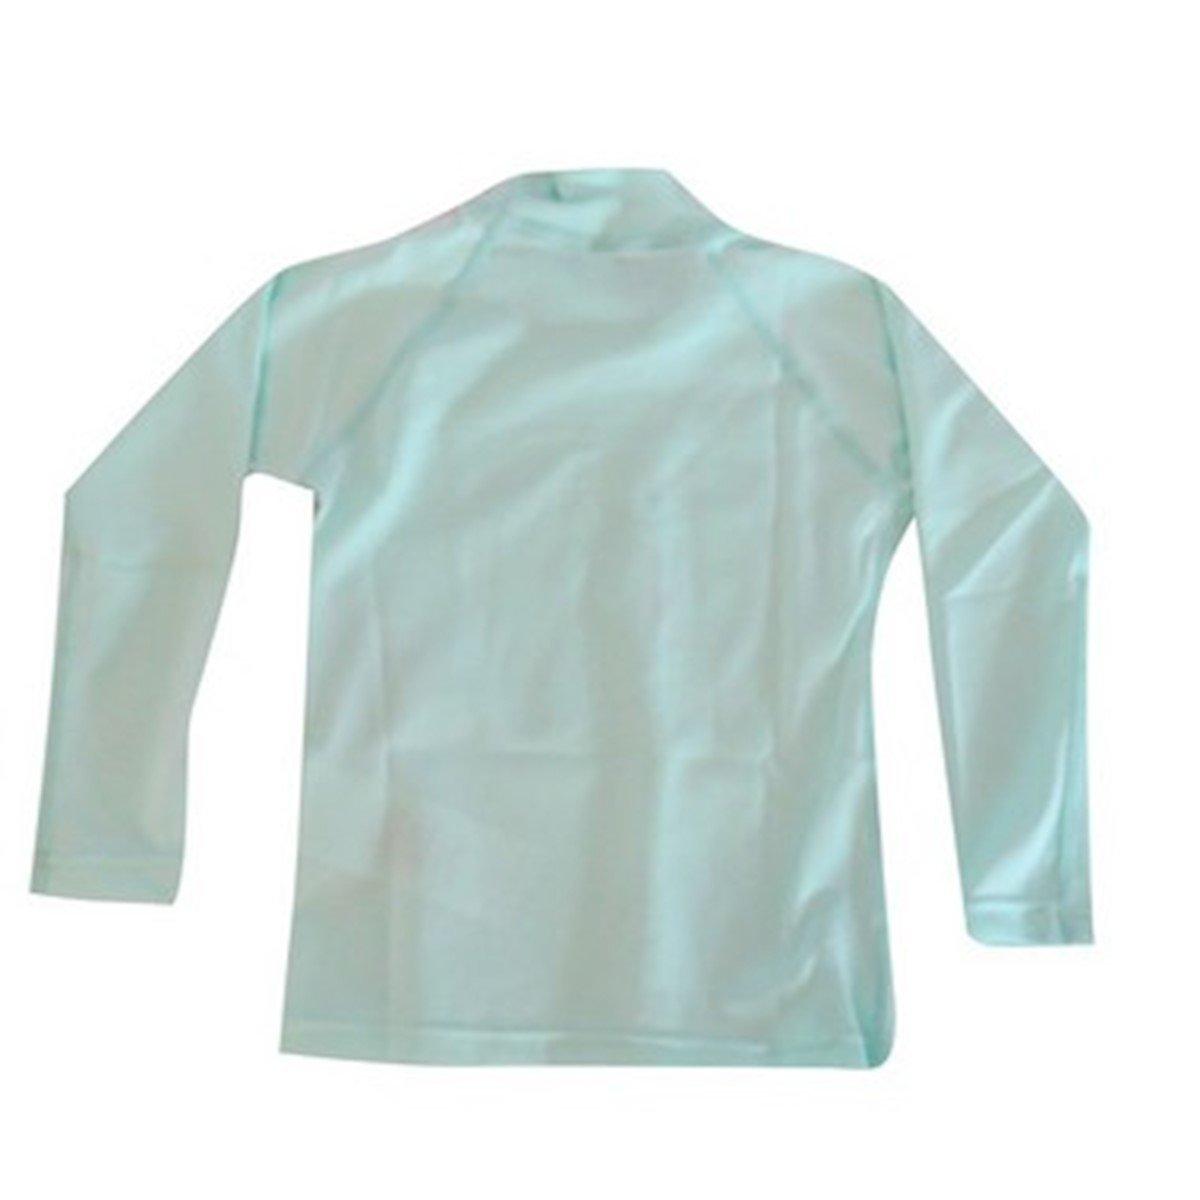 Lycra Lycra Mini UV Camiseta Curl Forever Rip UV Camiseta Verde Rip Curl nYgF1wqw